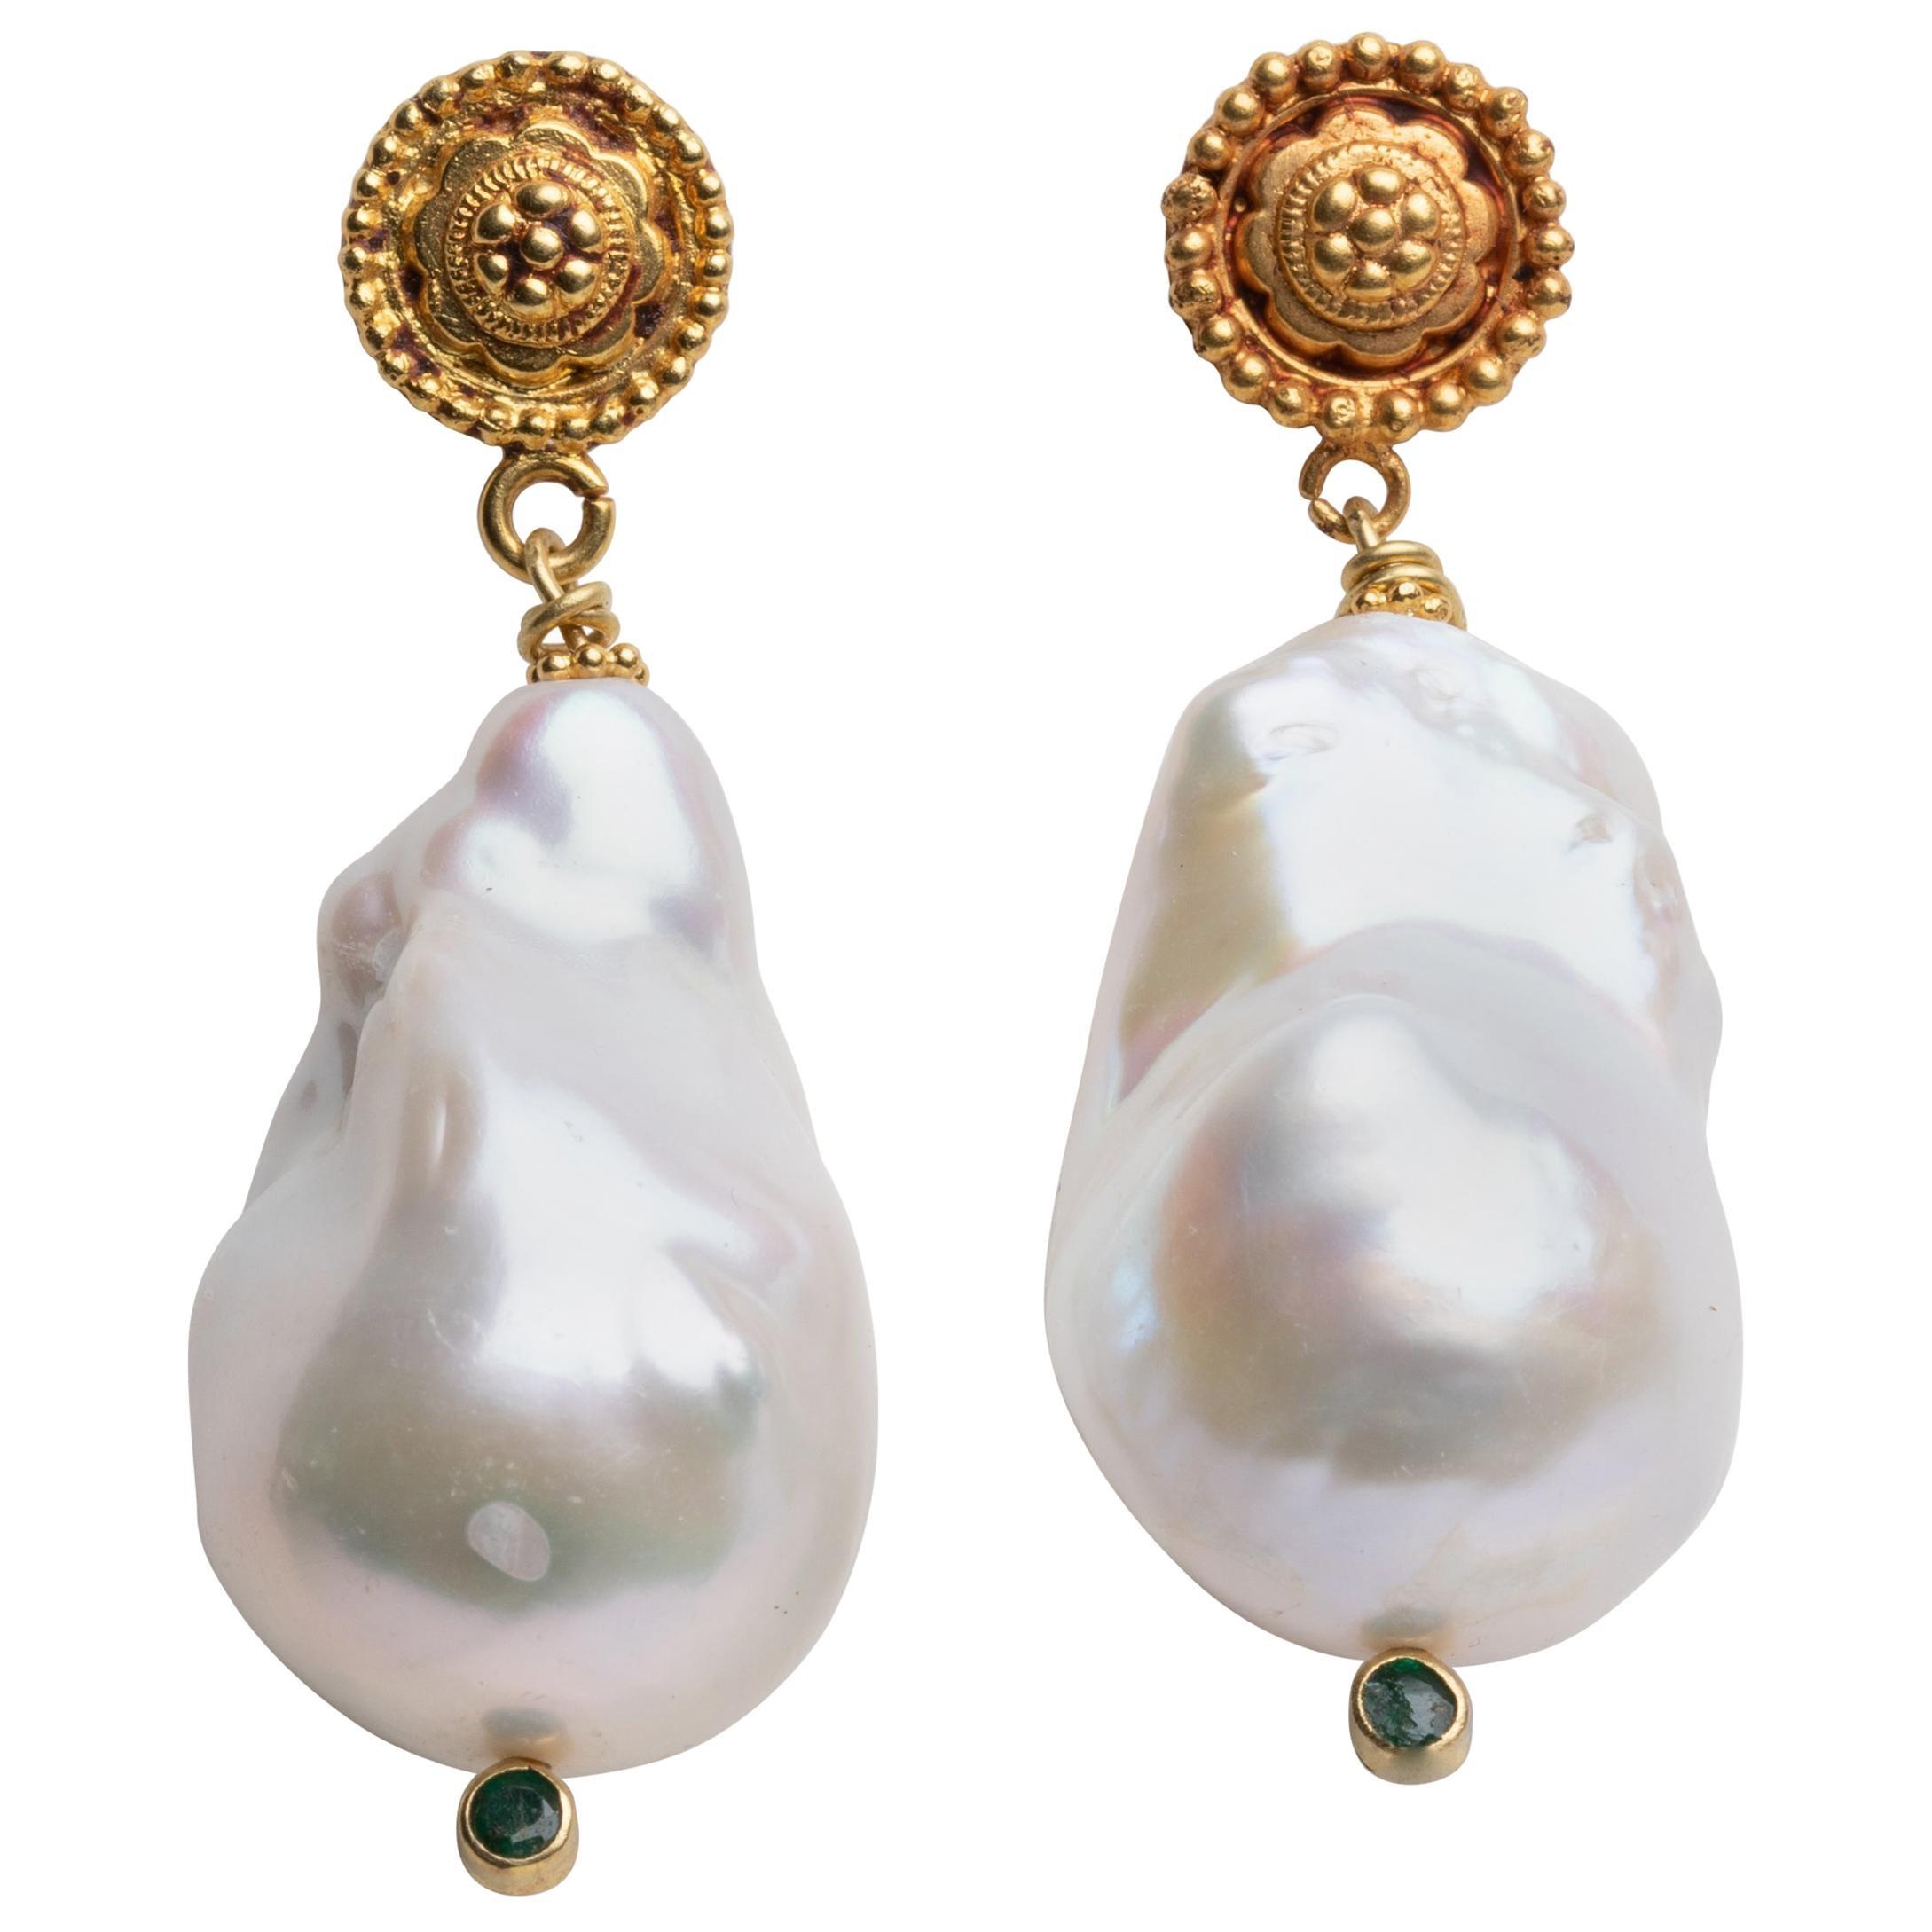 Baroque Pearl, Emerald and 22K Gold Drop Earrings by Deborah Lockhart Phillips